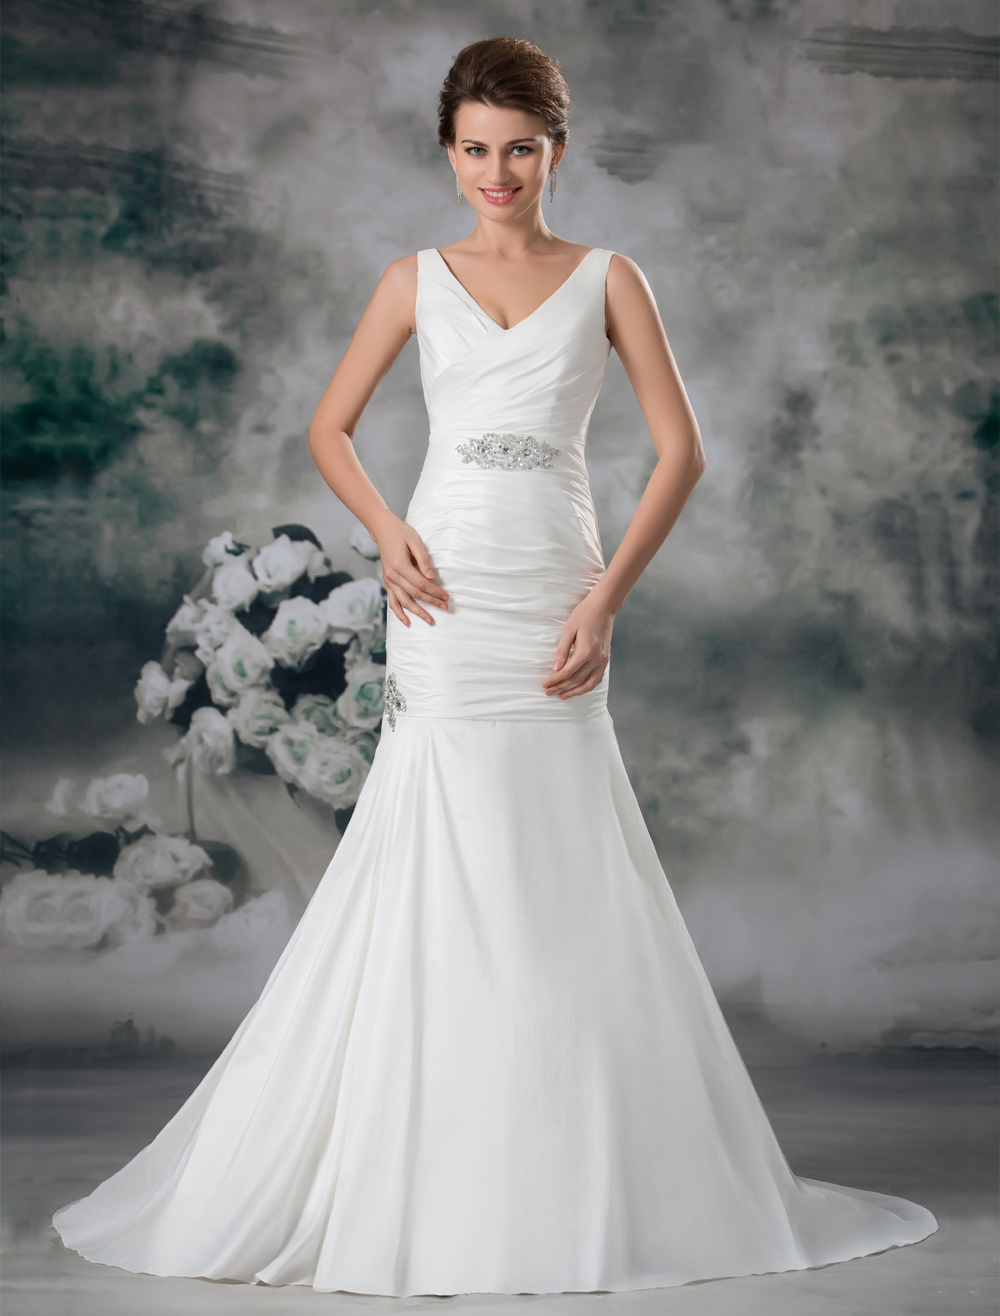 Ivory Beading Taffeta V-Neck Off-The-Shoulder Mermaid Wedding Dress